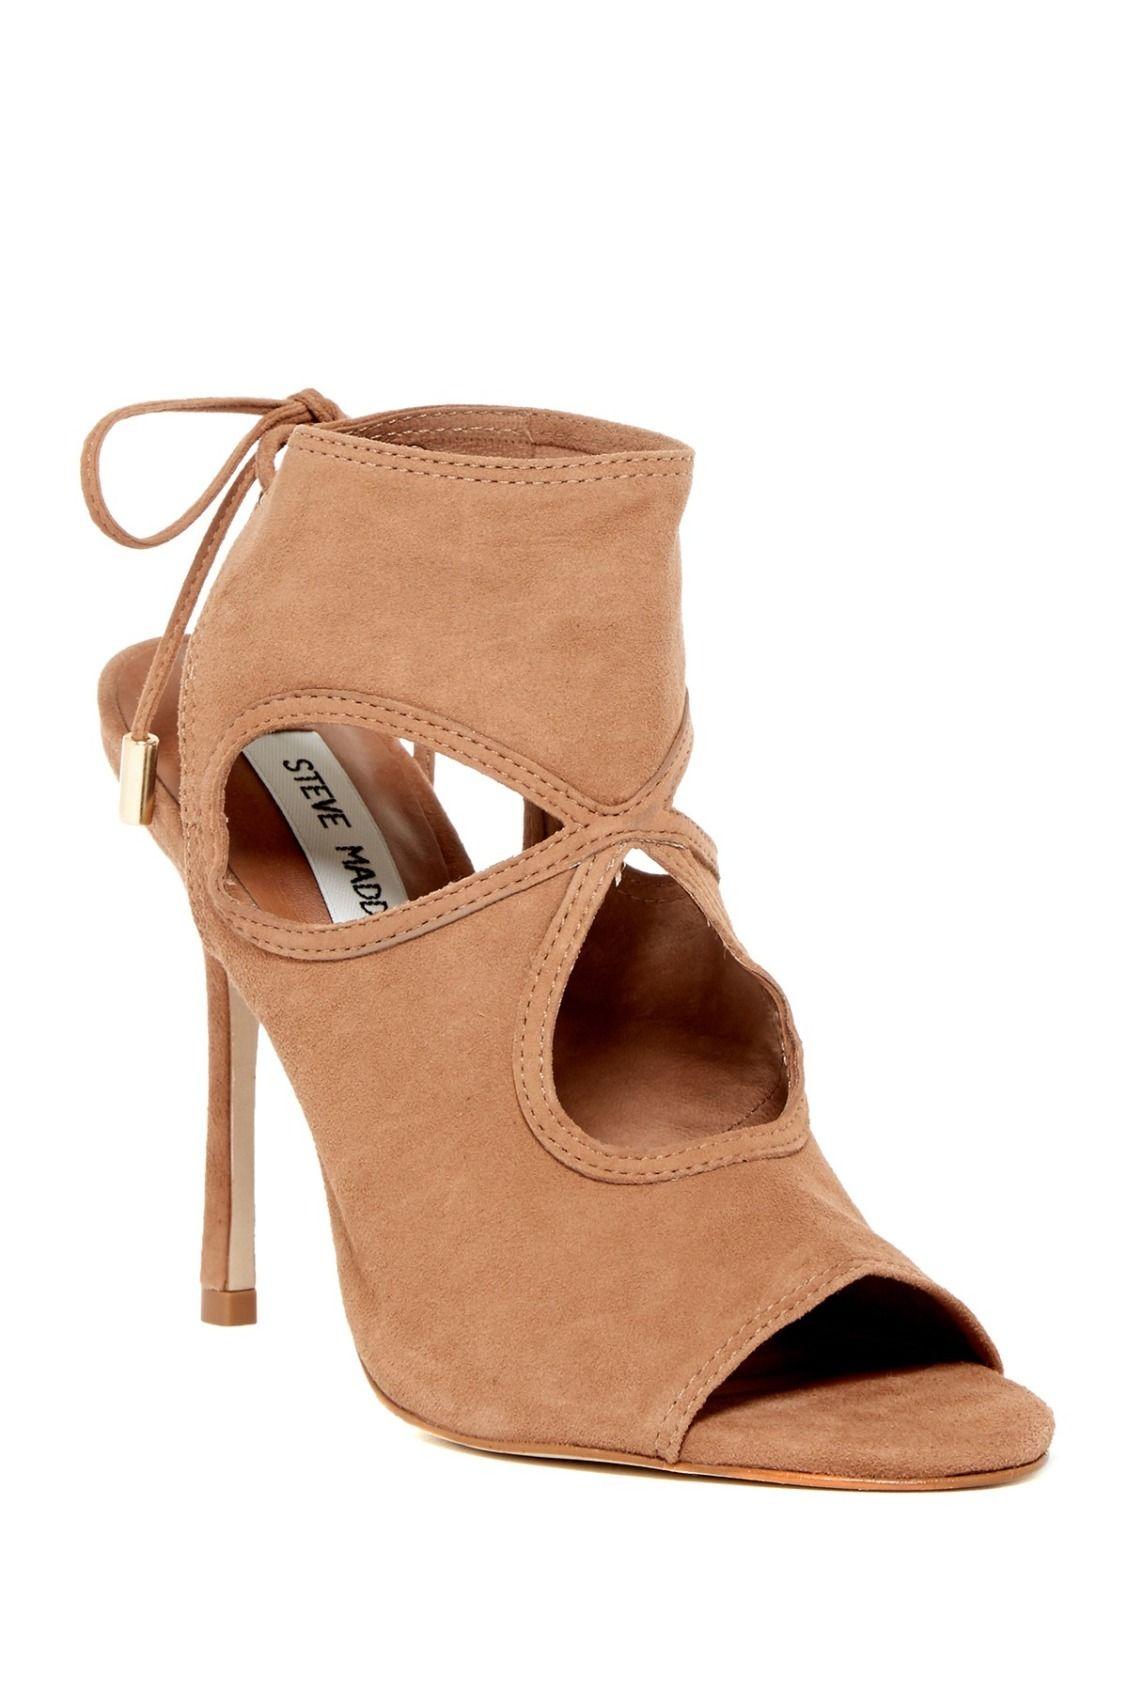 cf78394e643 Love these Natural Steve Madden Sharlit Lace Heel Sandals Кружева Каблуки